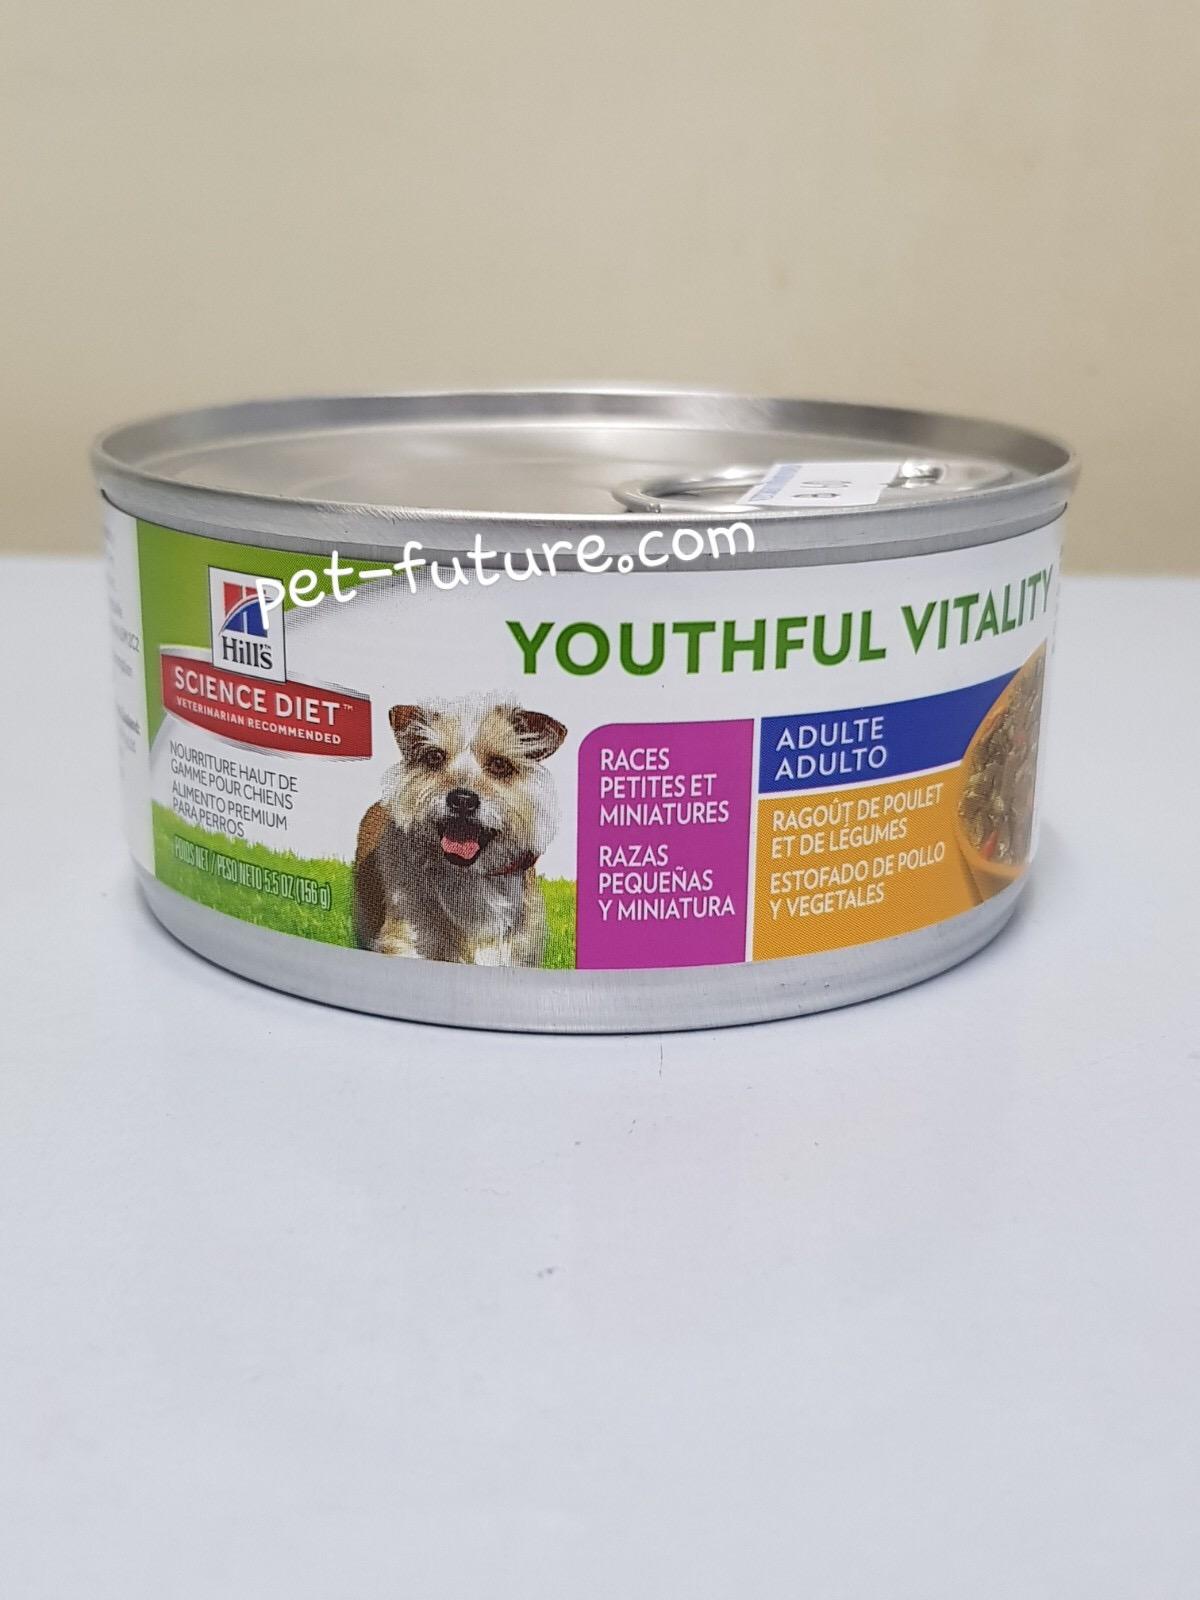 Youthful Vitality adult7+Toy รสไก่และผักแบบสตรู Exp.02/20 ขนาด 156 กรัม